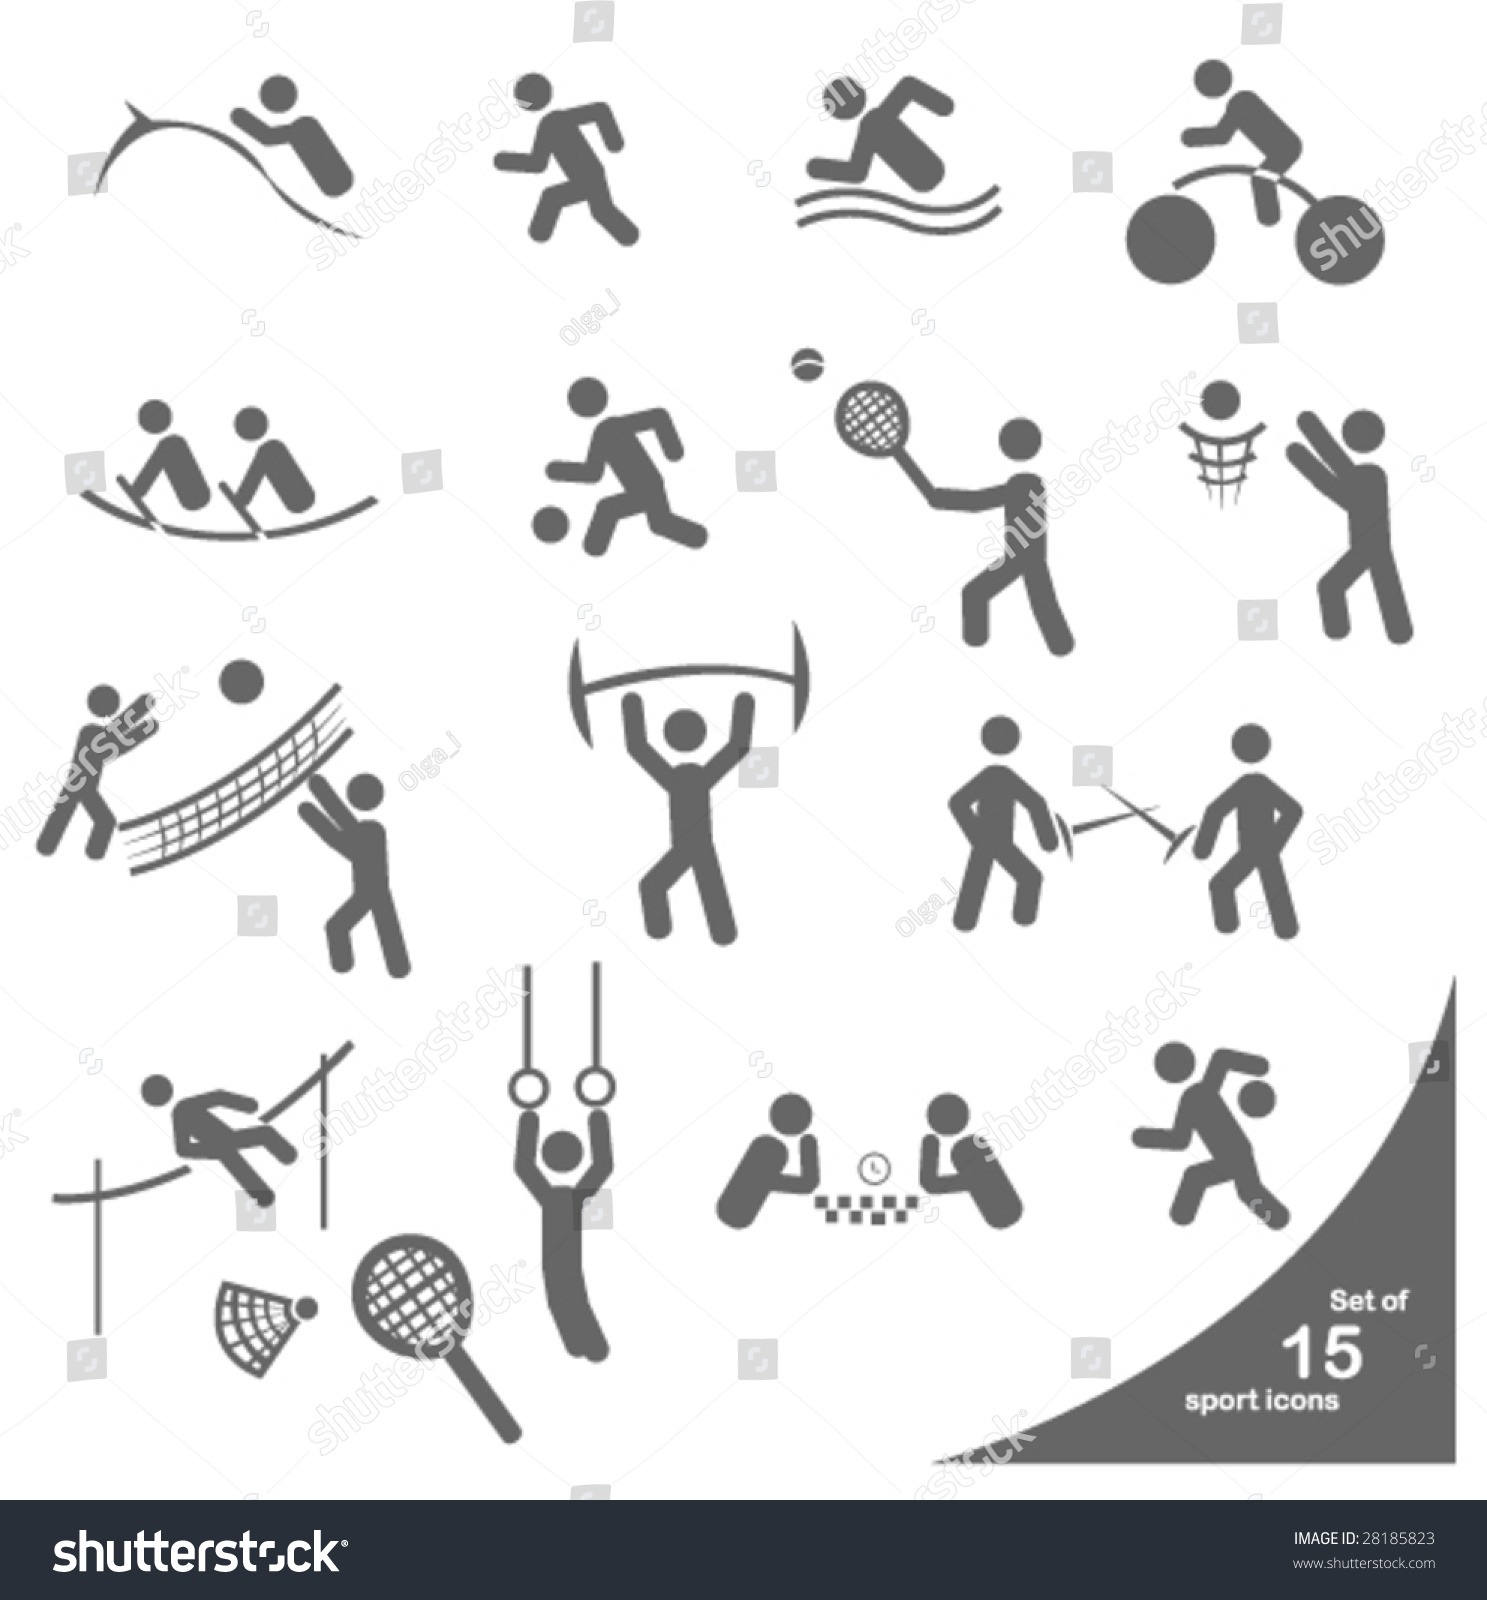 Sport symbols stock vector 28185823 shutterstock sport symbols biocorpaavc